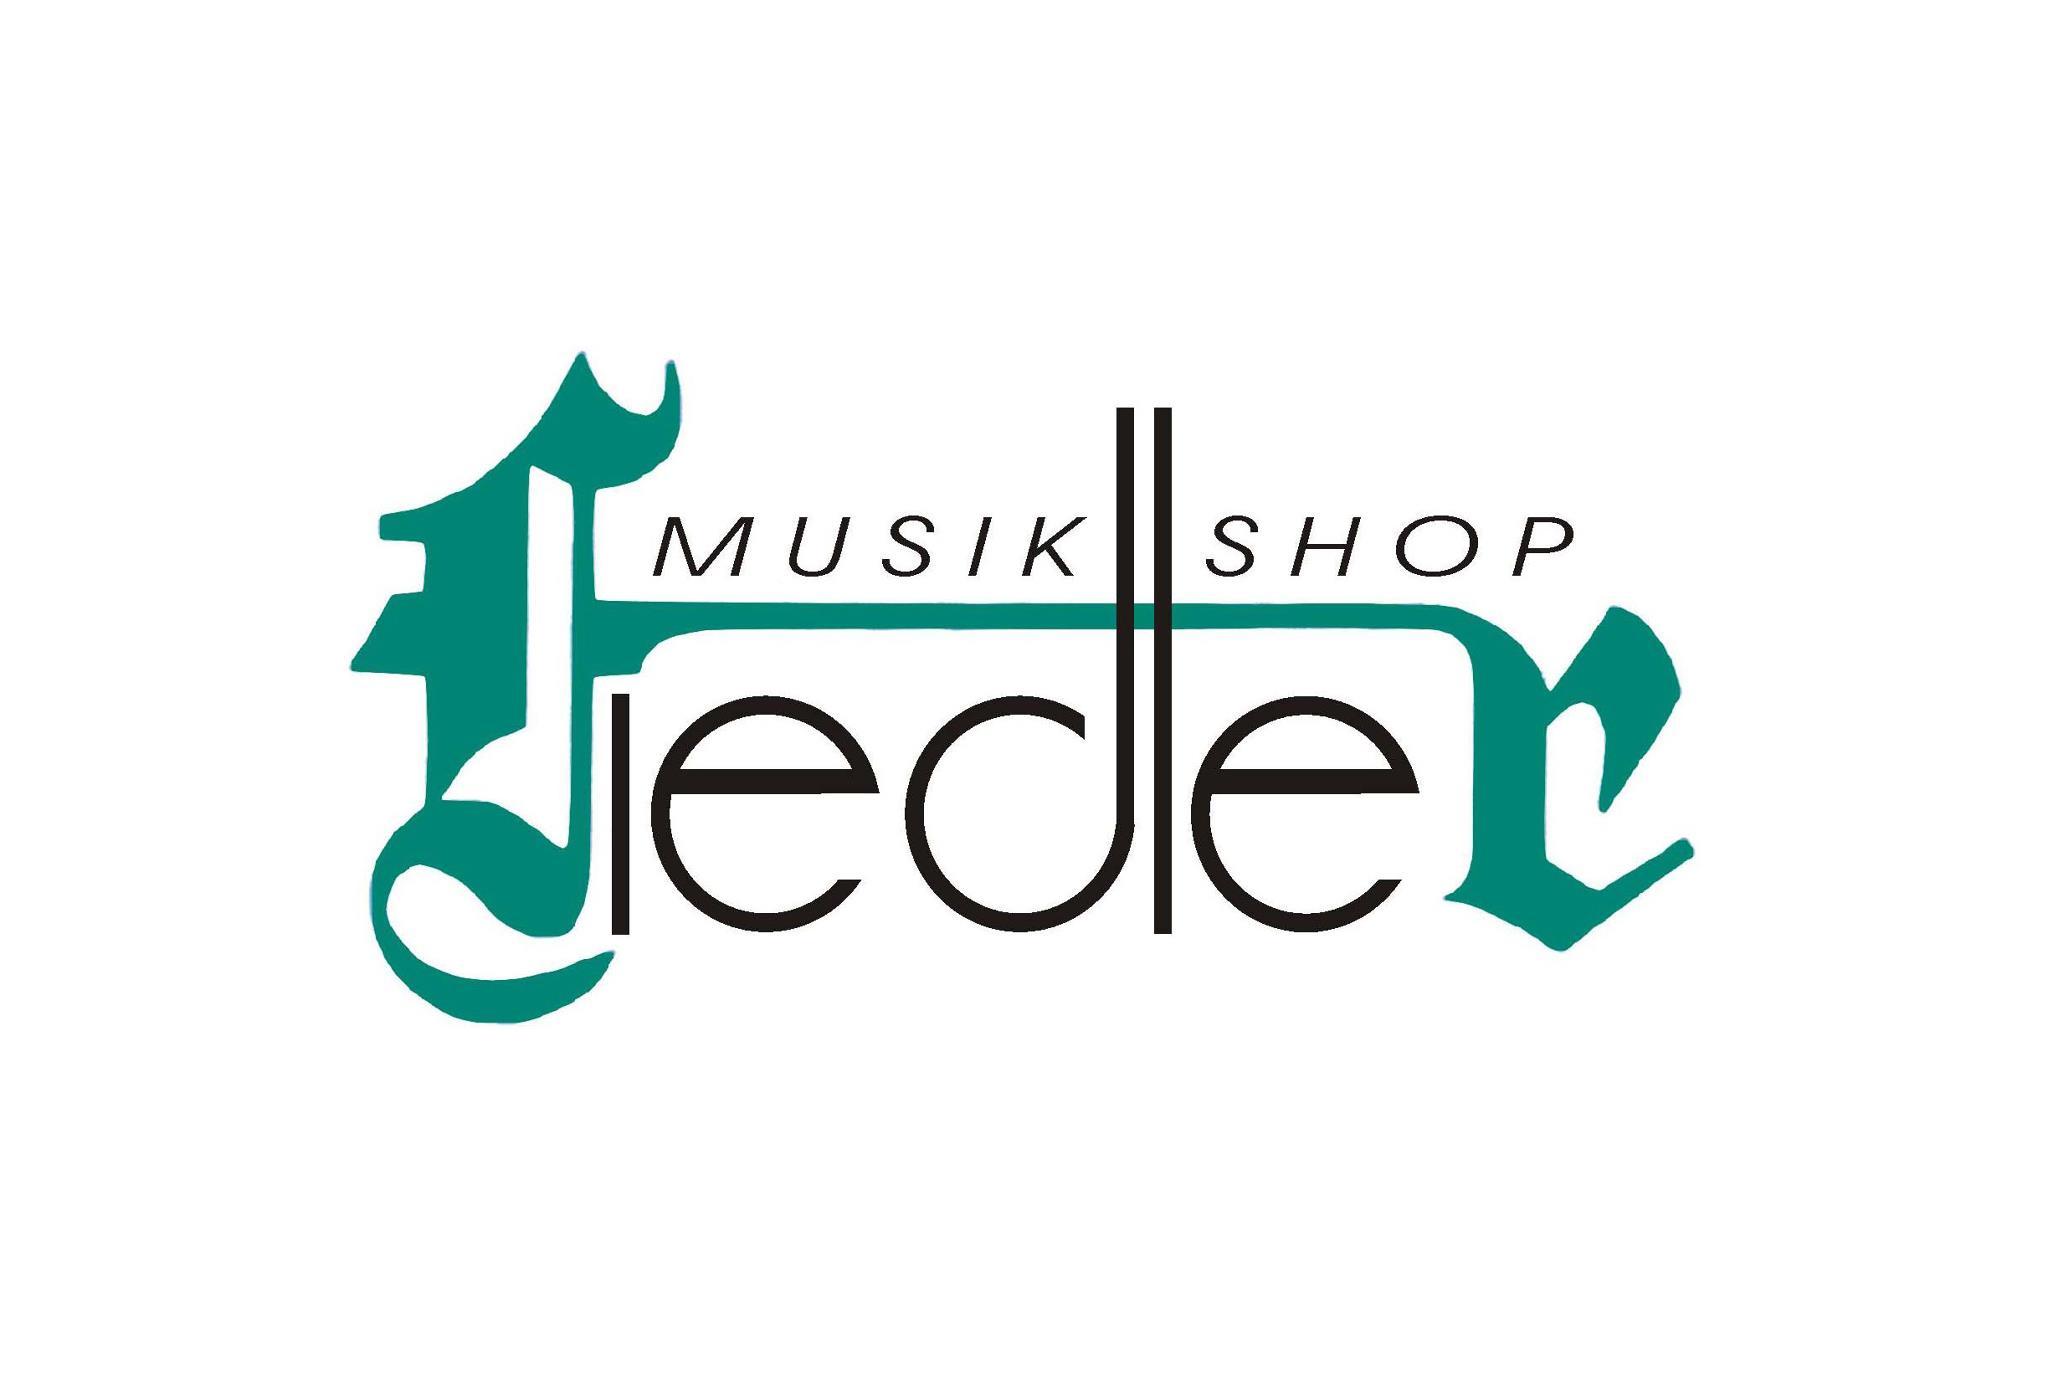 Musikshop Fiedler Logo